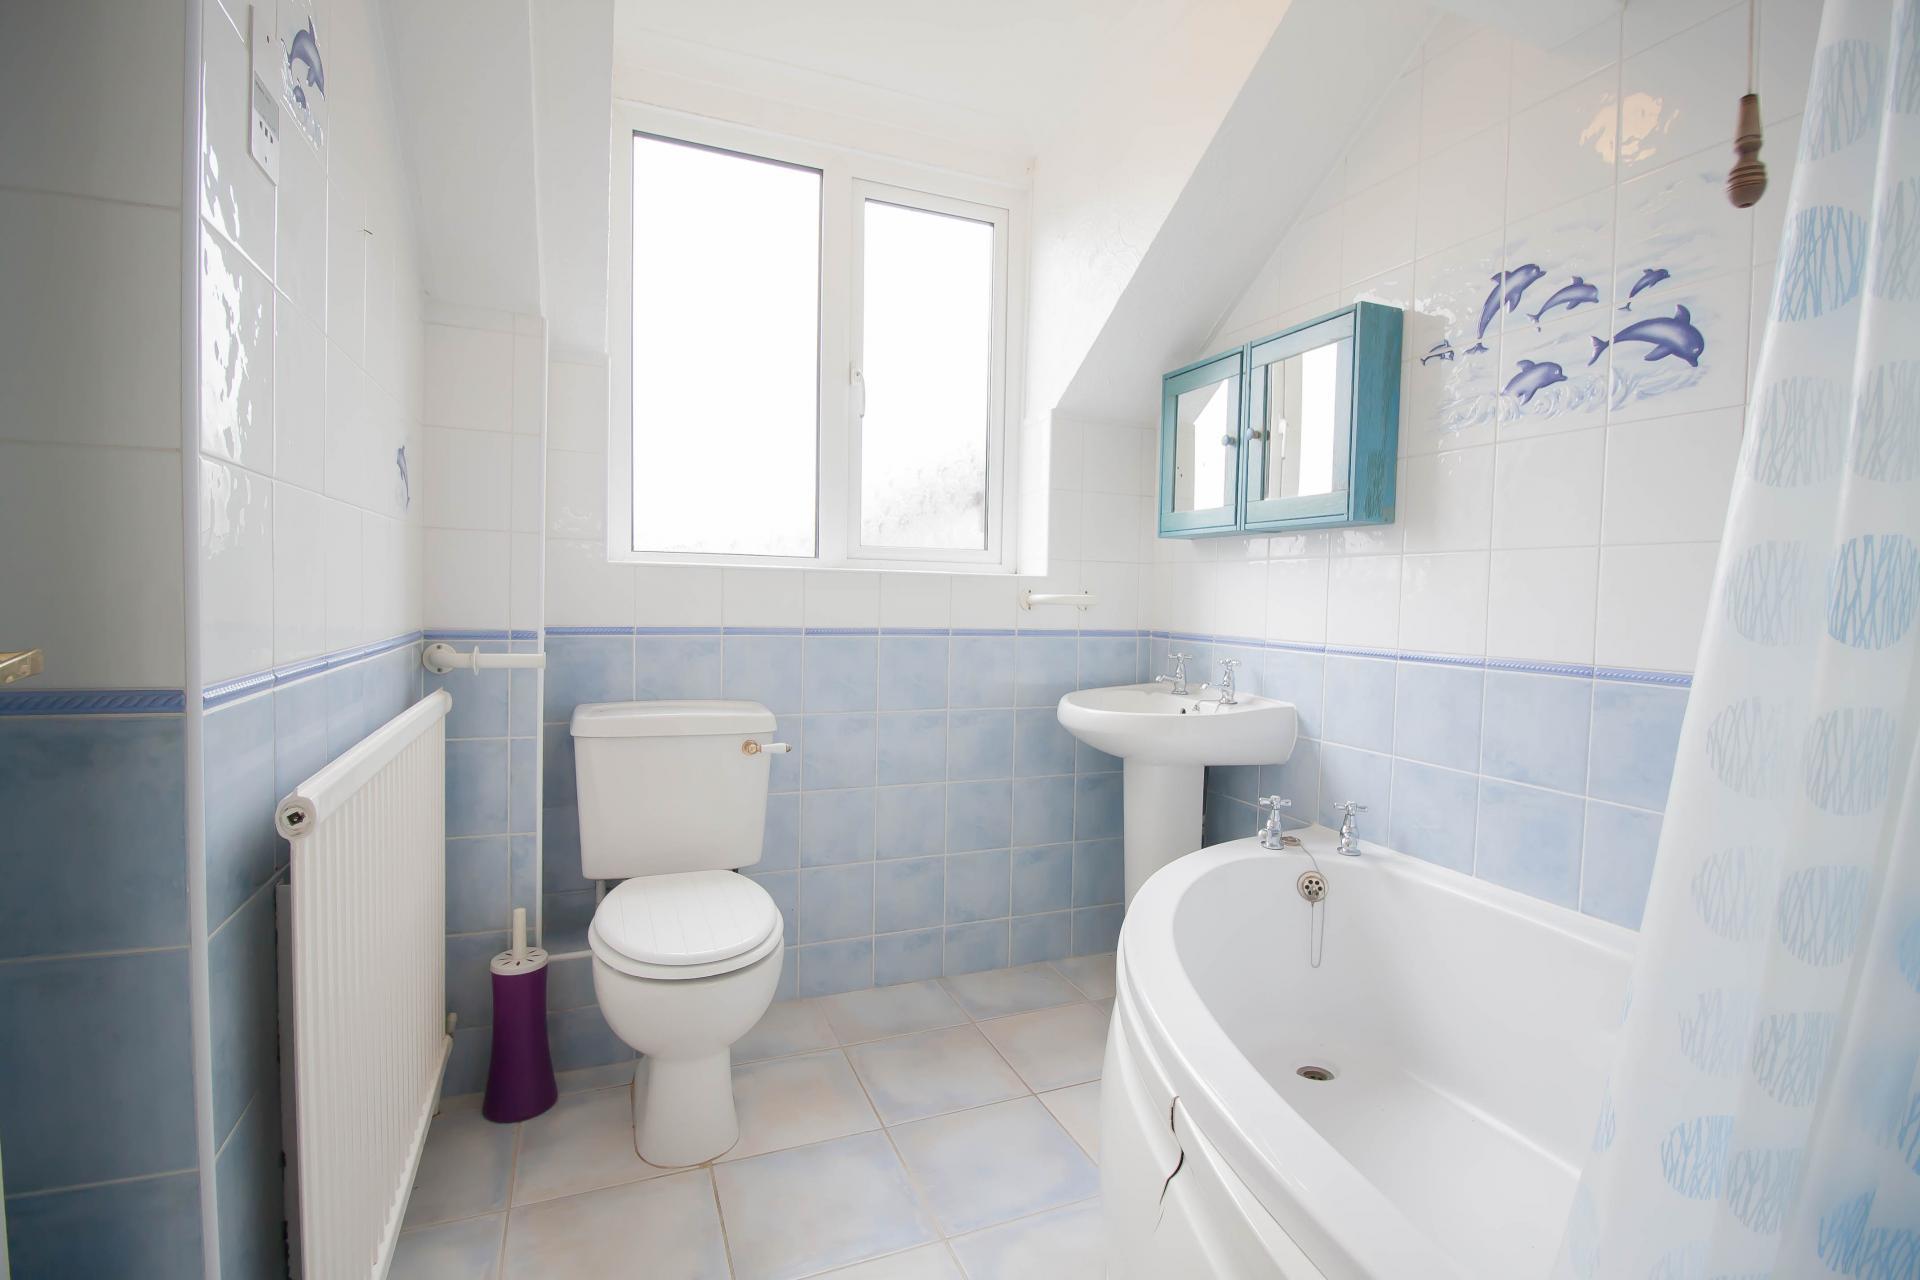 Property For Sale In Pimperne